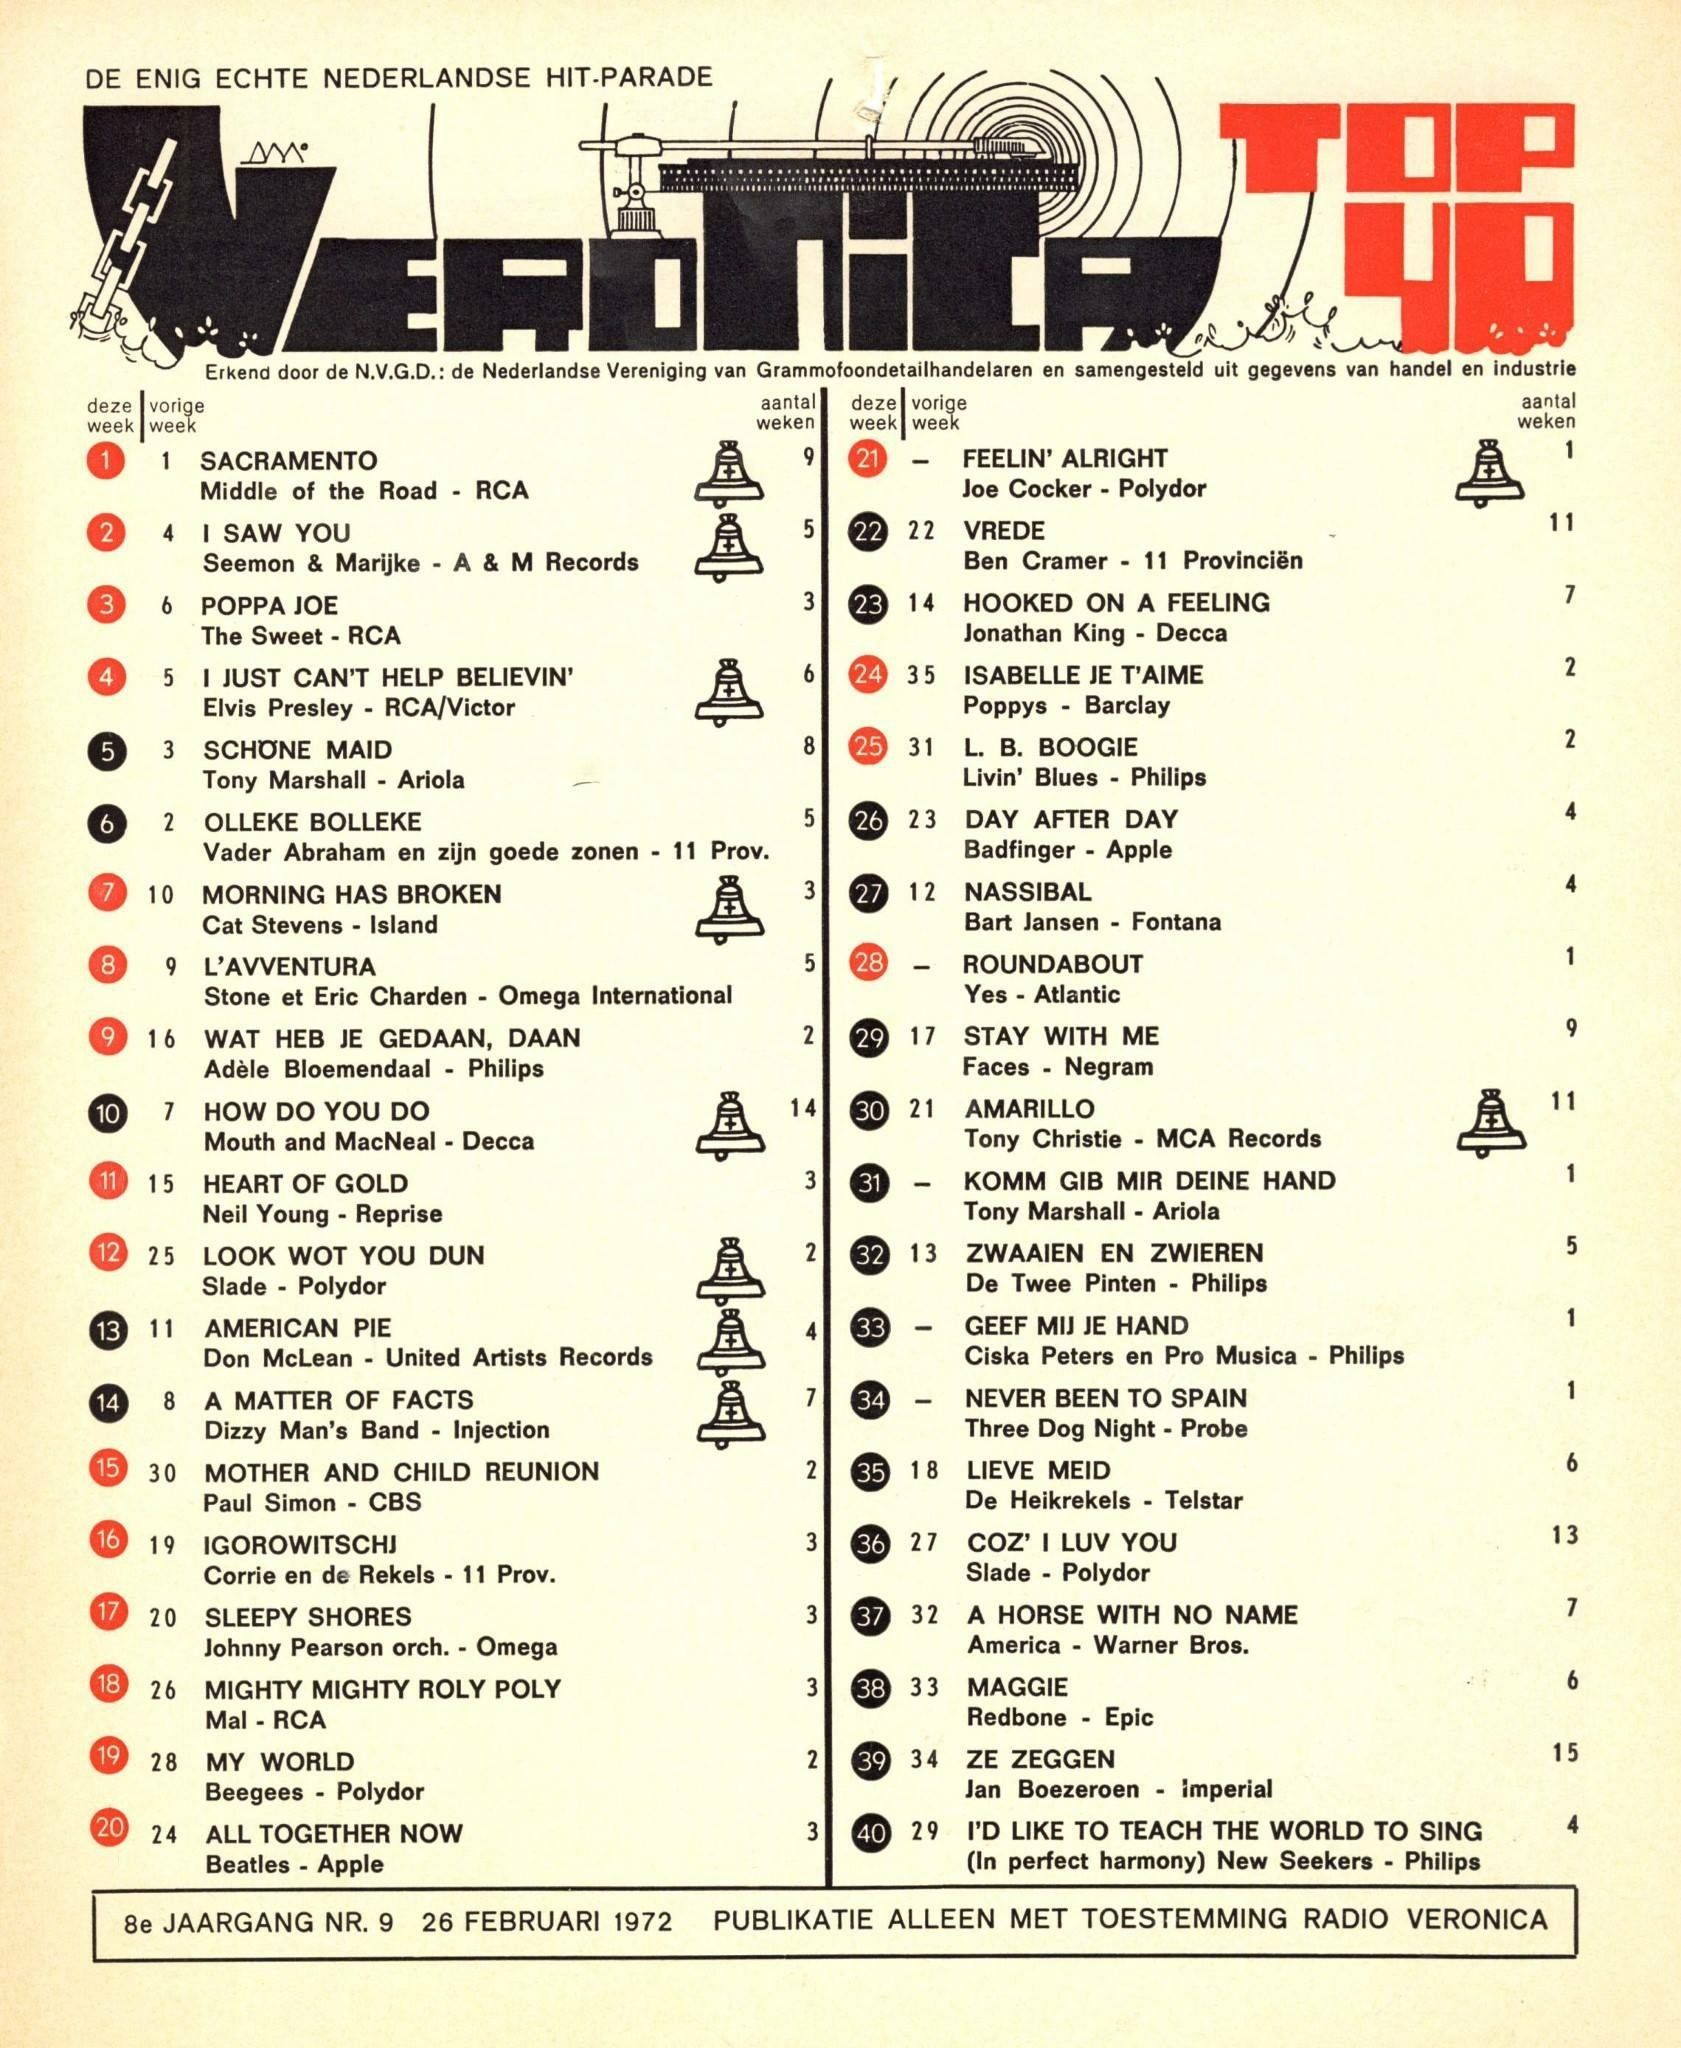 110 Ideeën Over Les Poppys   Muziek, Jeugdherinneringen, Julio Iglesias